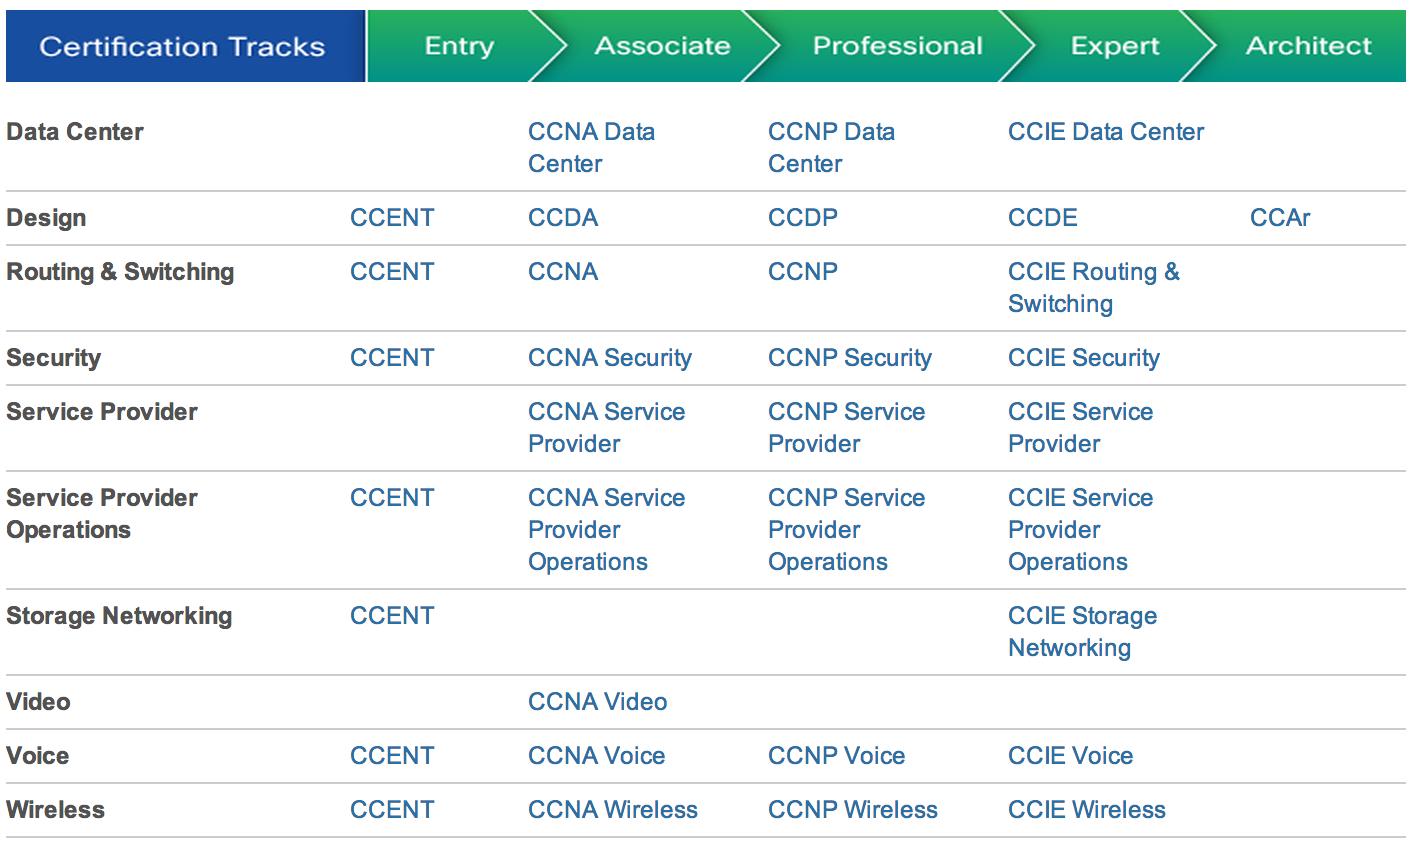 Ccna data center training in bangalore dating 3